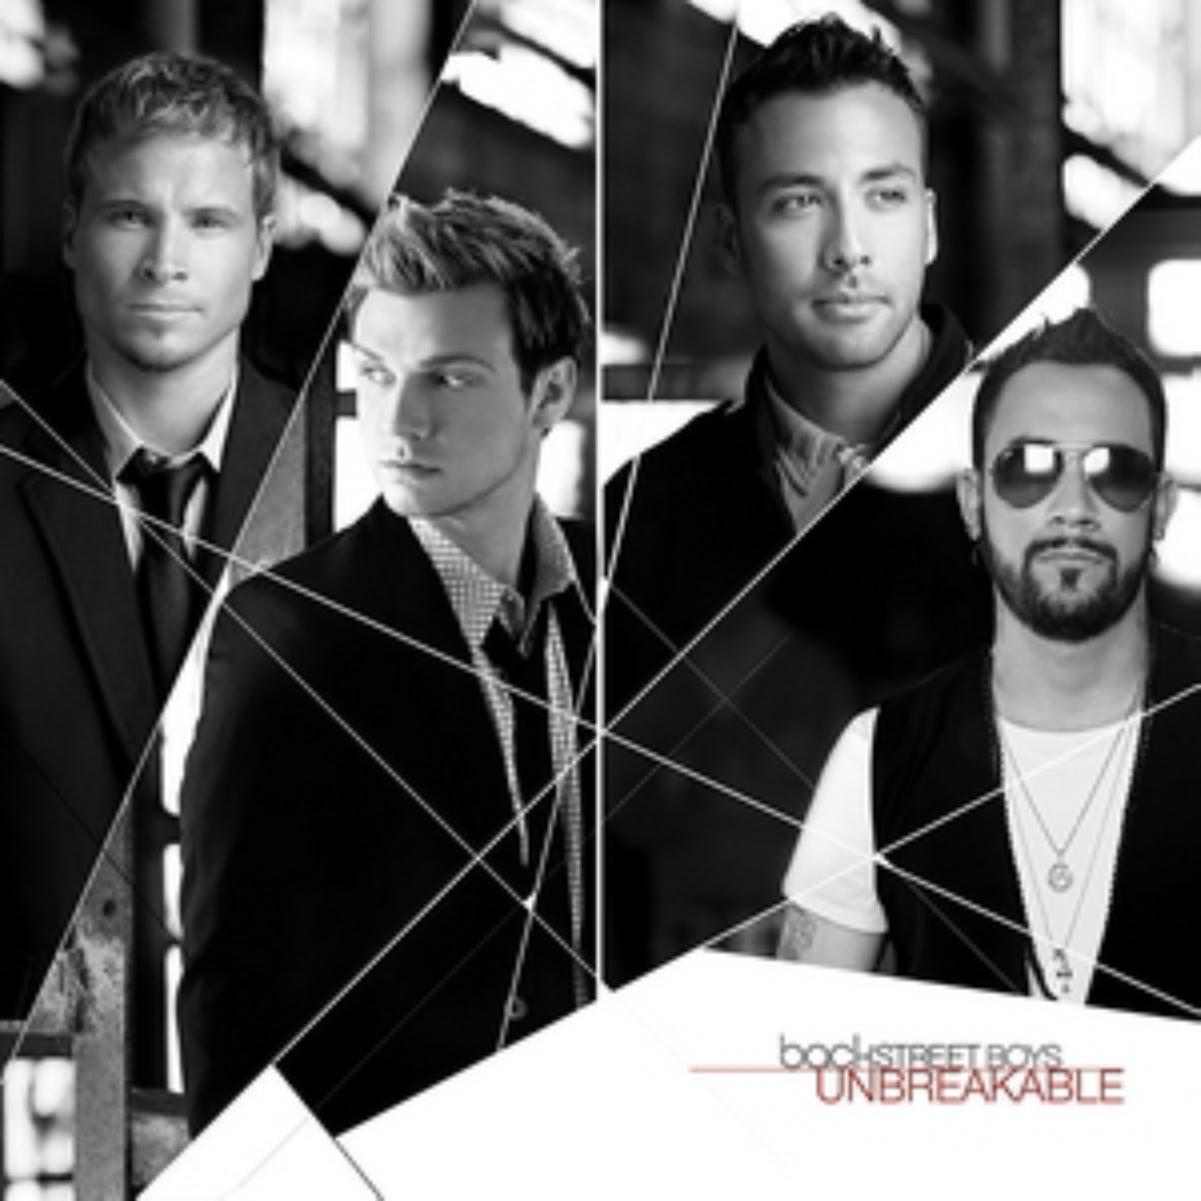 Unbreakable (Backstreet Boys album) Wiki